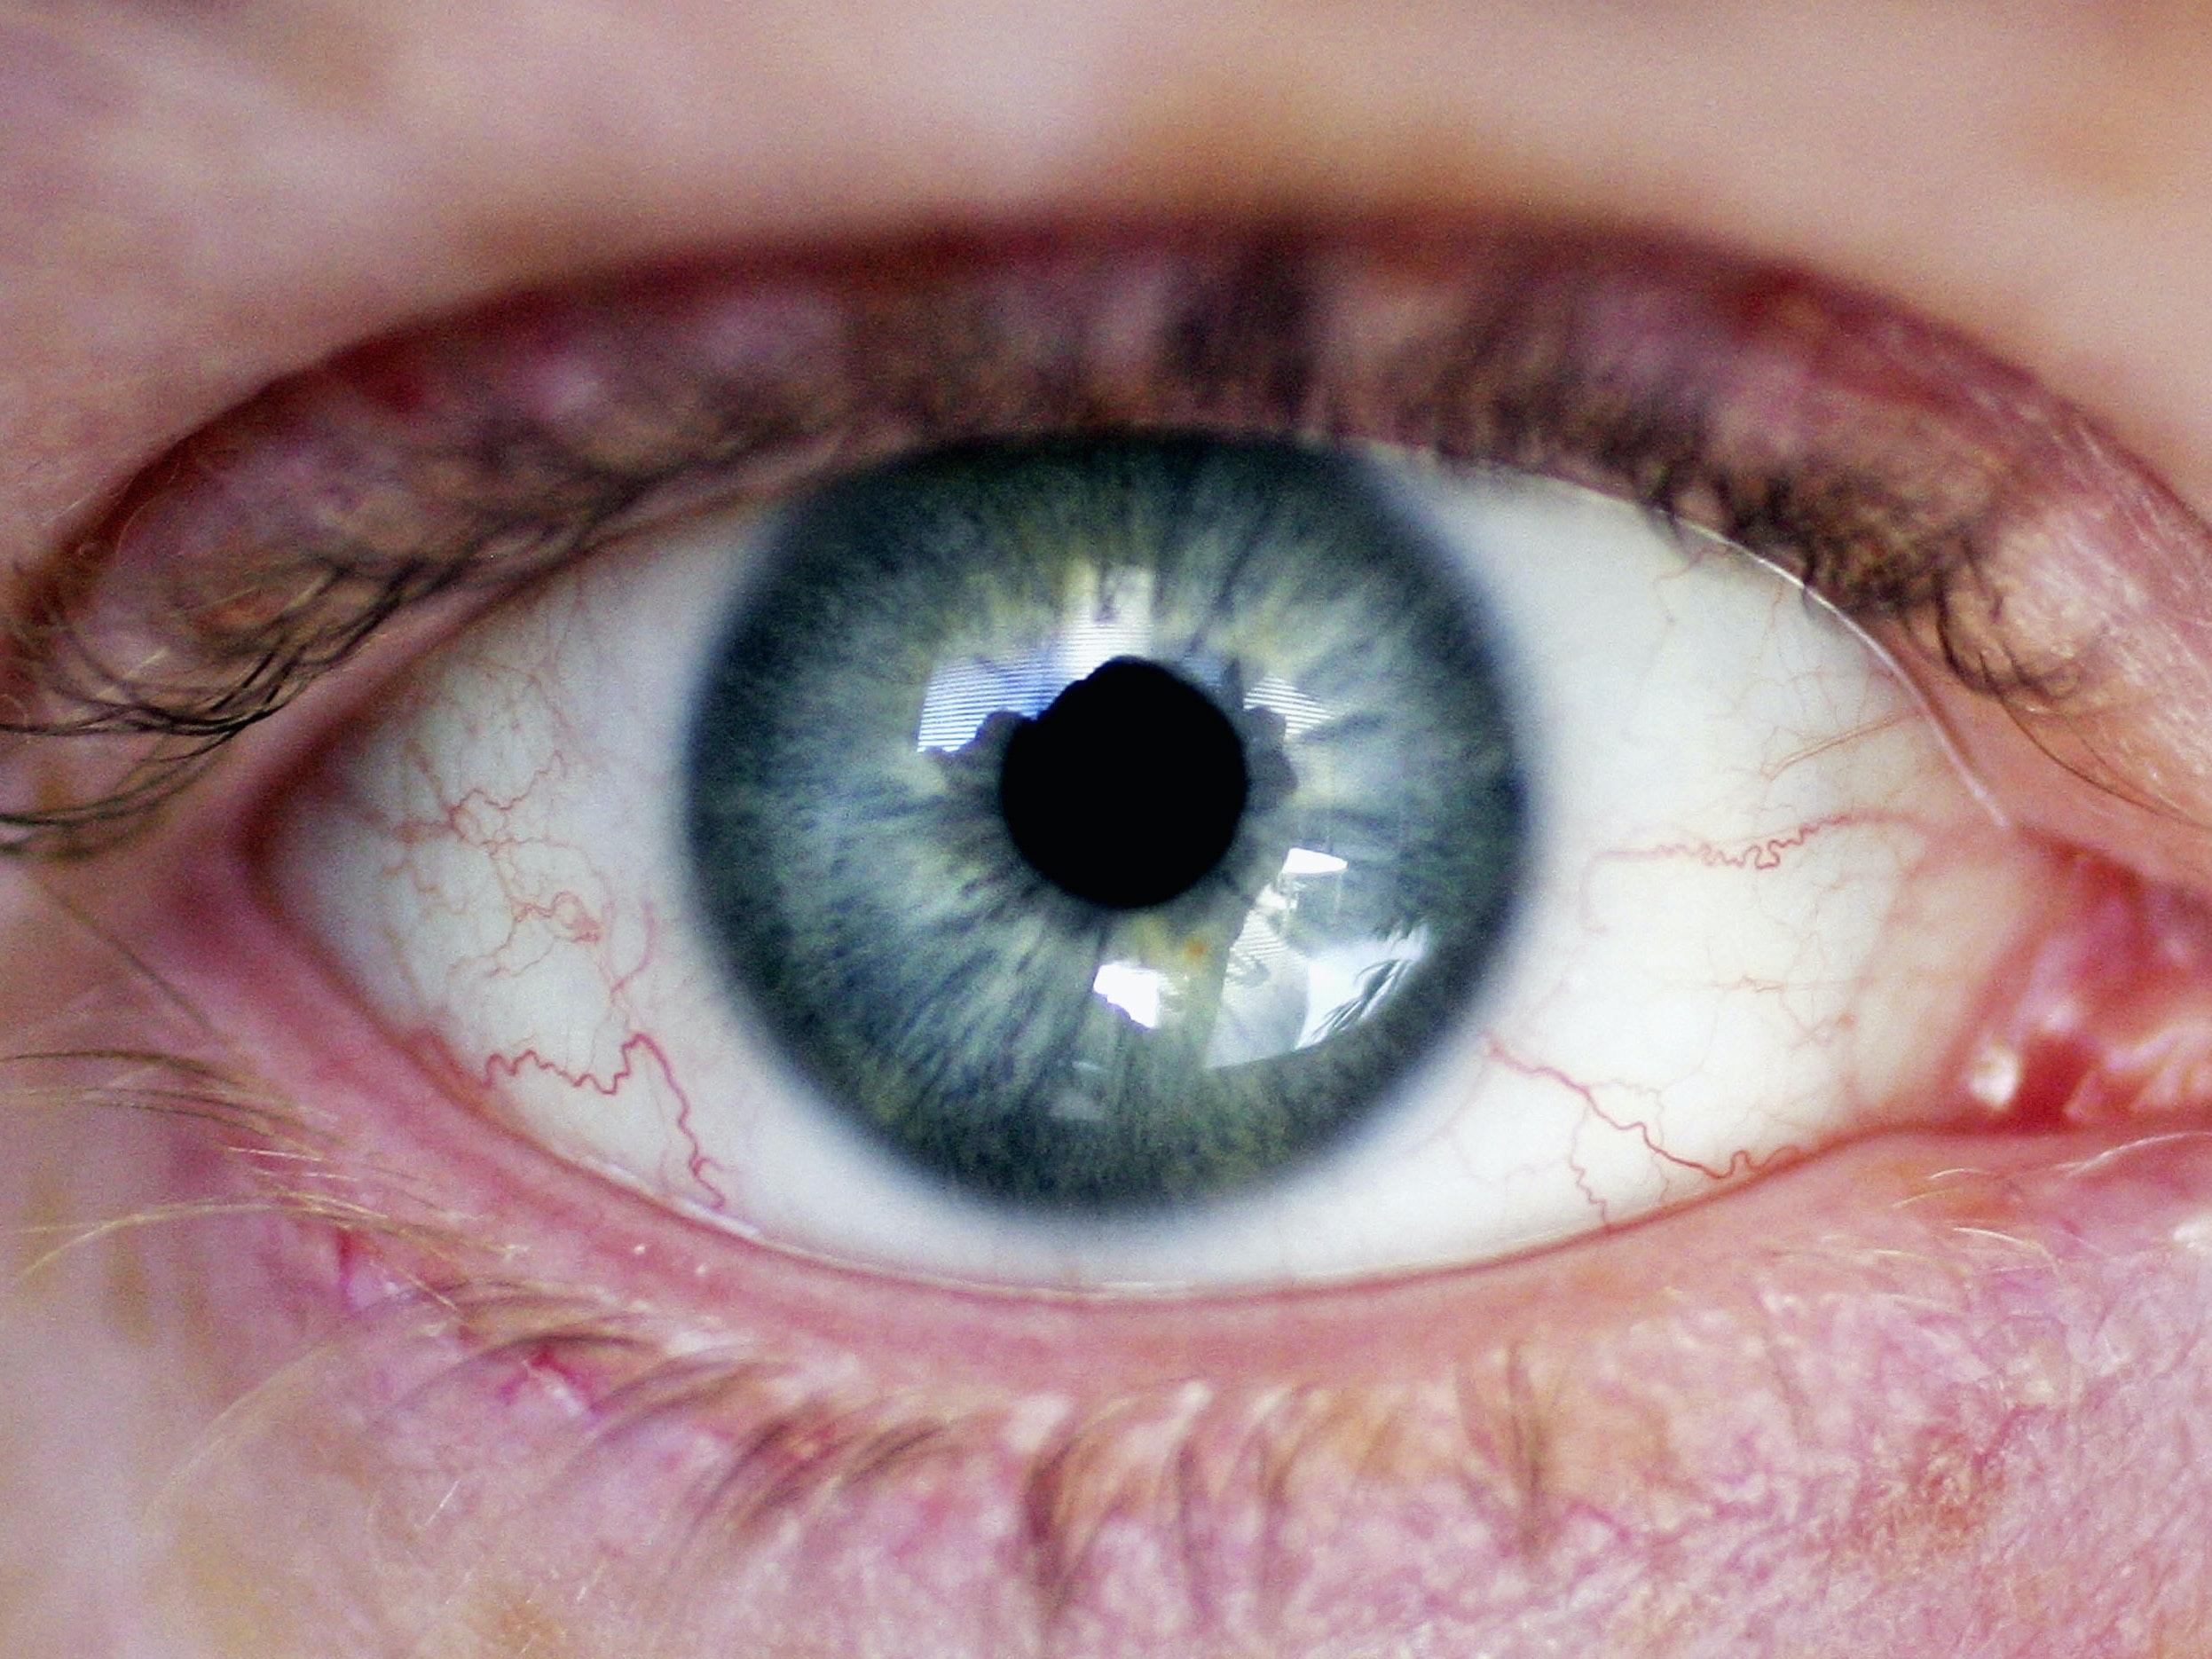 Google DeepMind May Scan Eyes to Spot Diseases